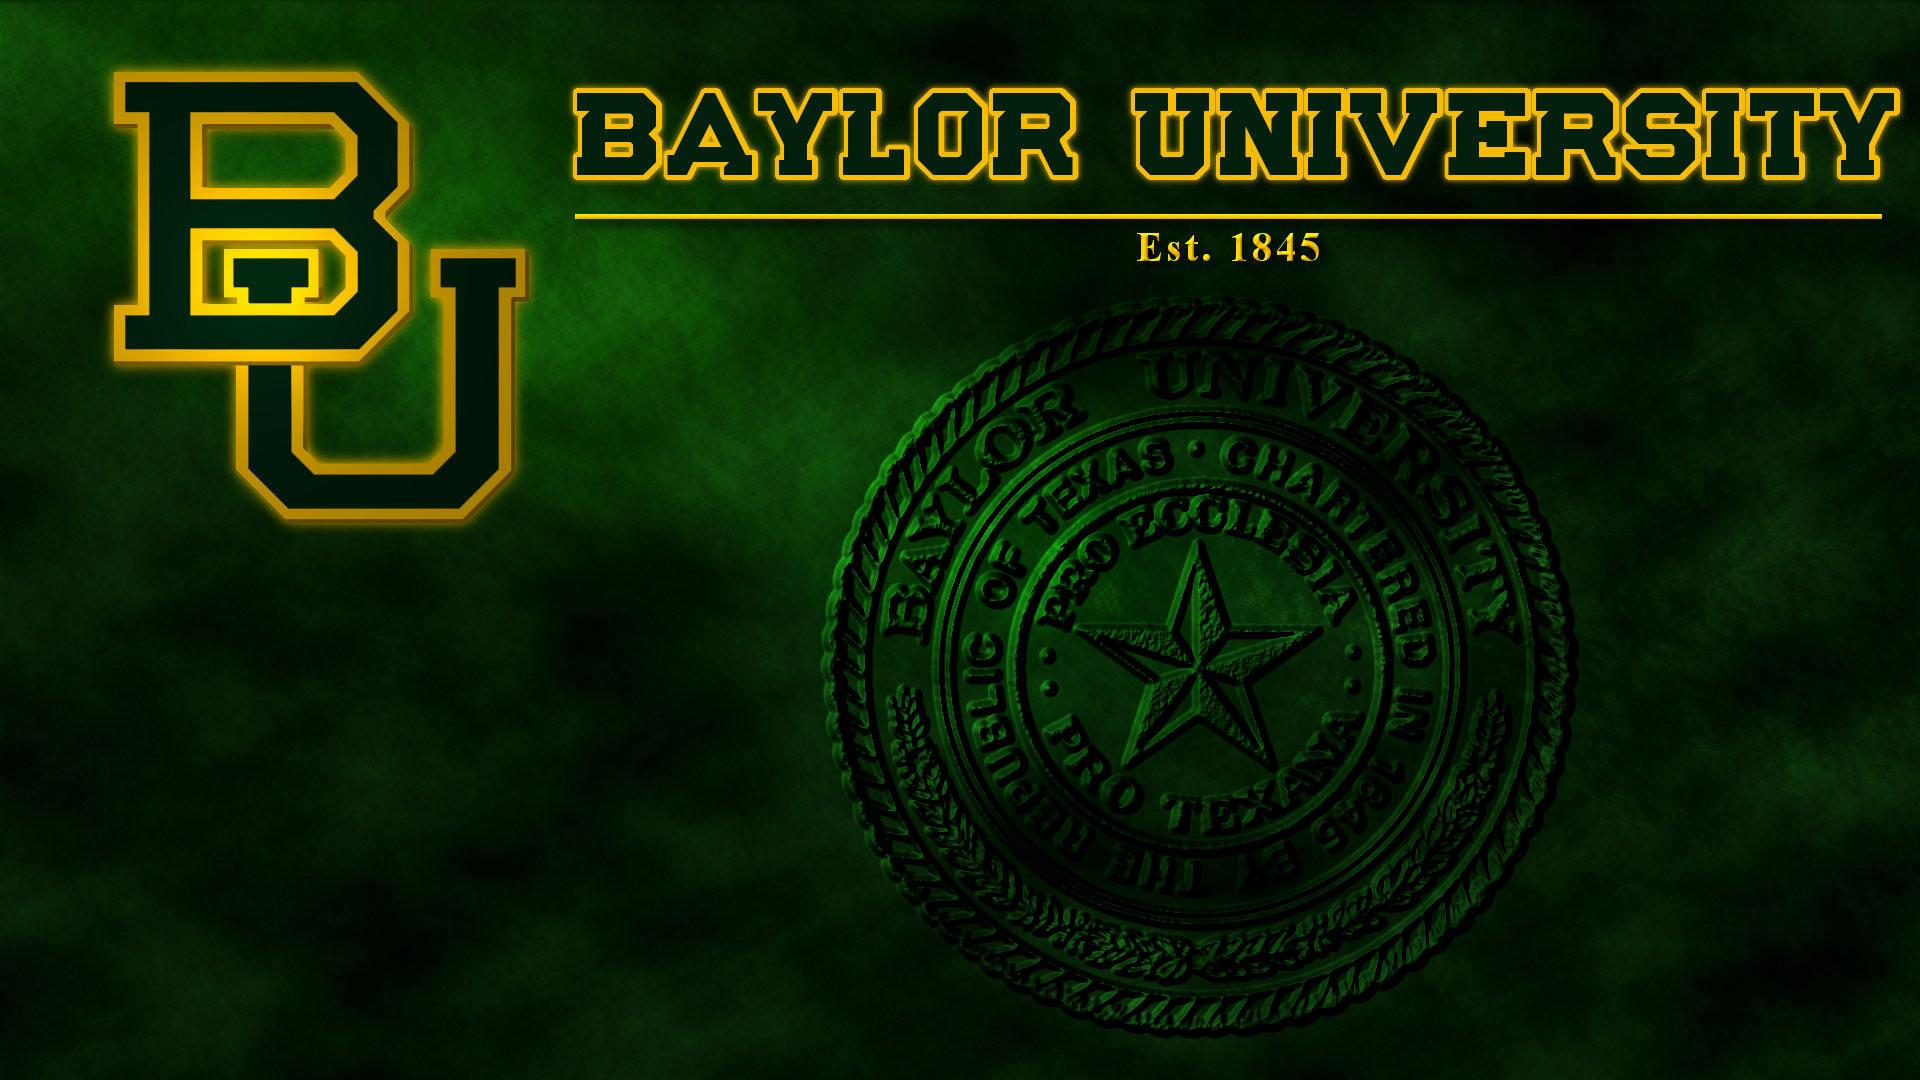 Baylor University Wallpaper 1920x1080